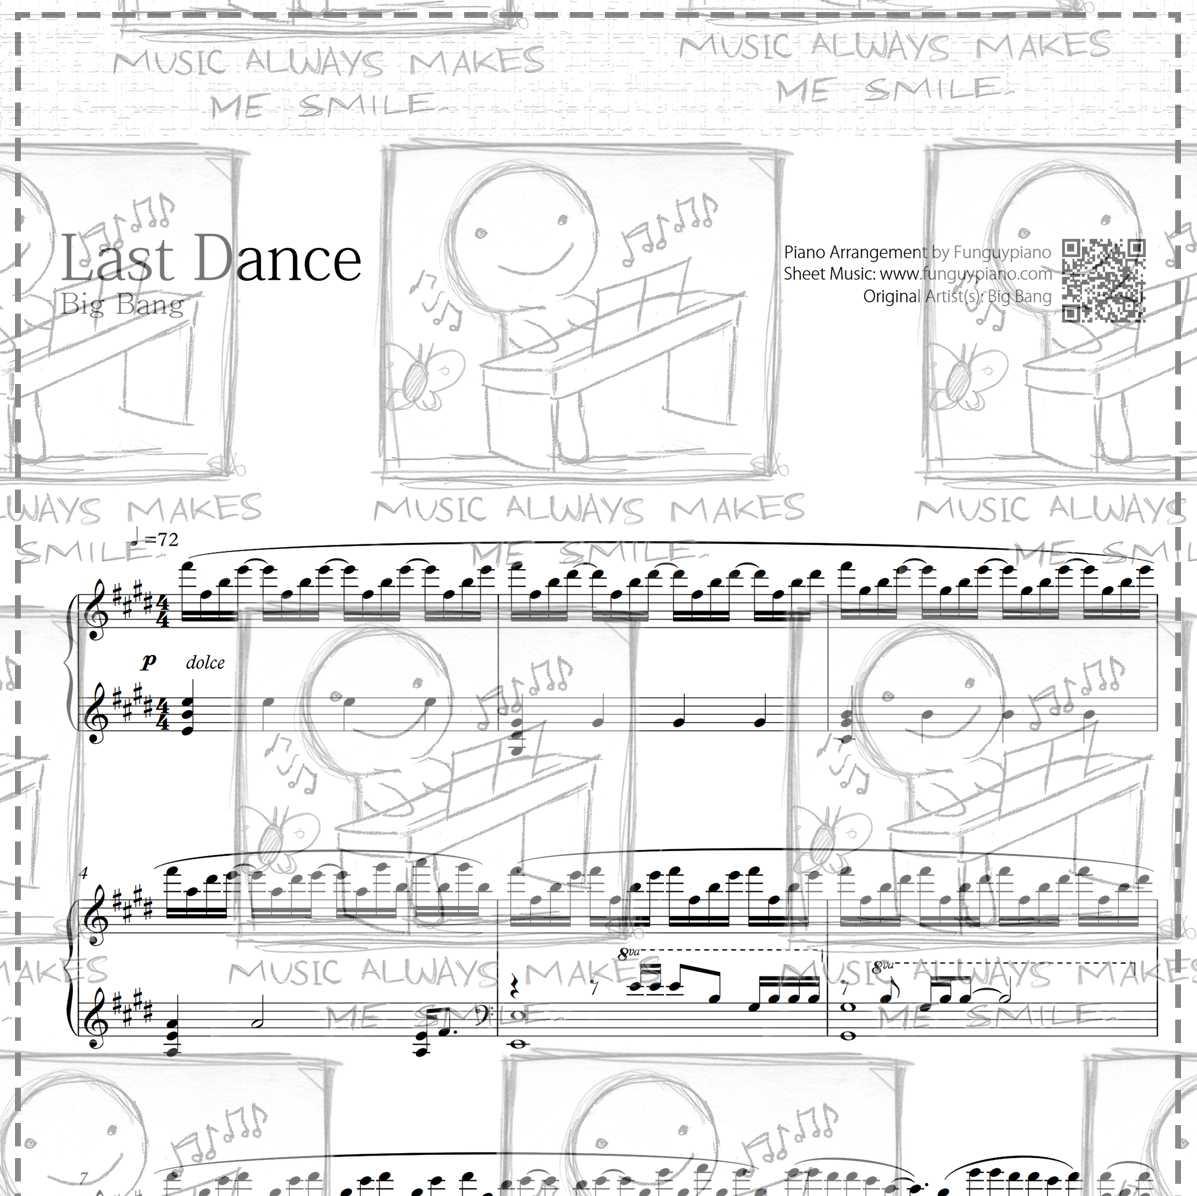 Big Bang - [MADE] Last Dance [ Sheet Music / Midi / Mp3 ]